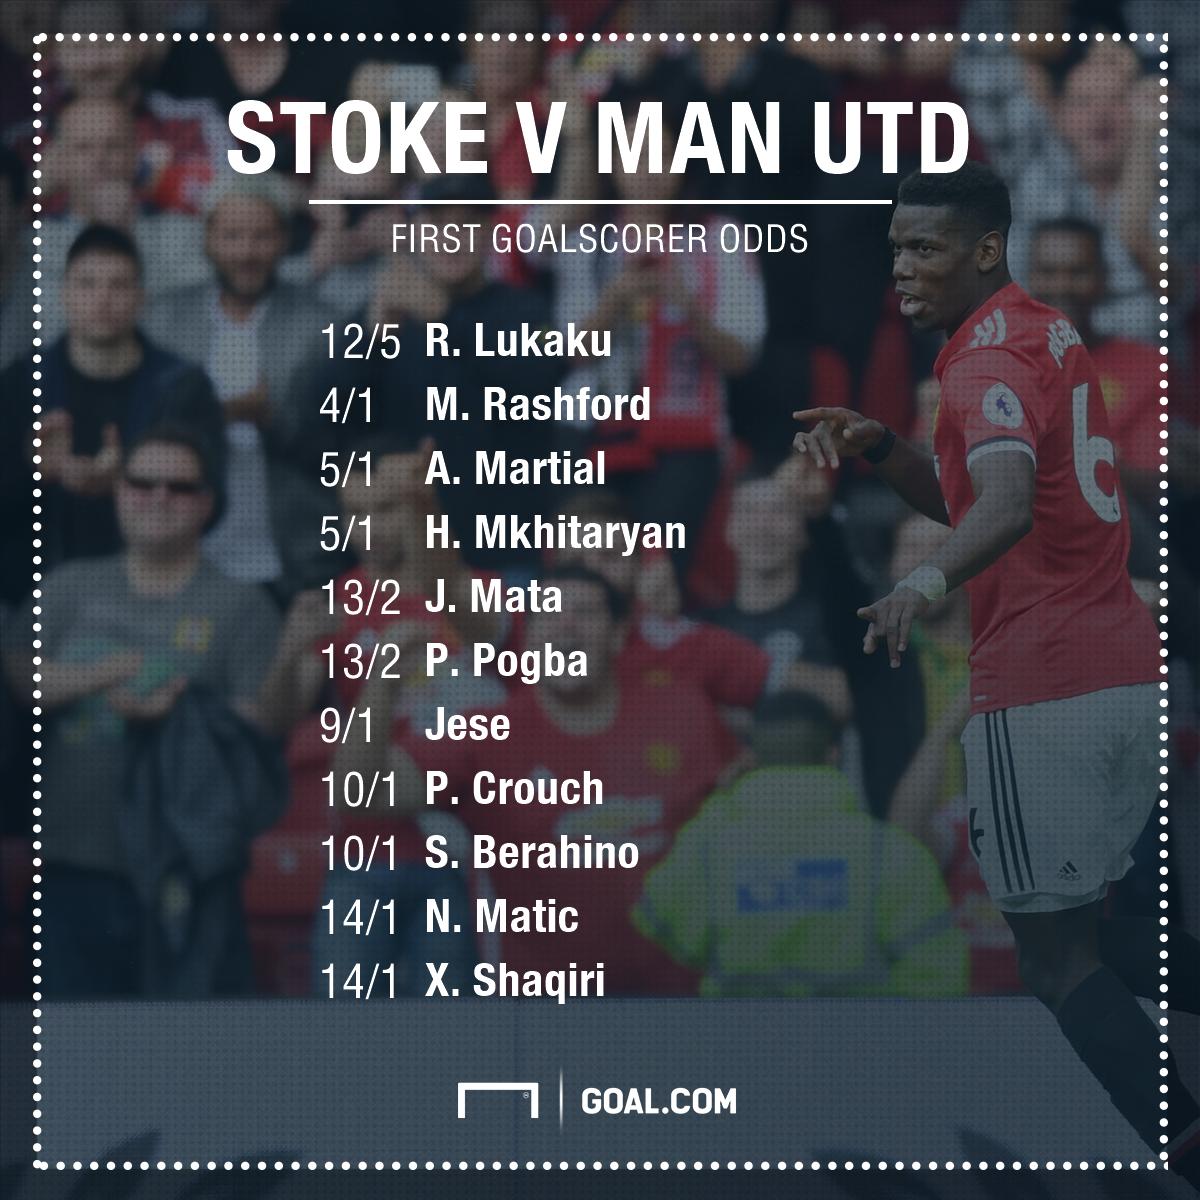 Stoke City Manchester United odds